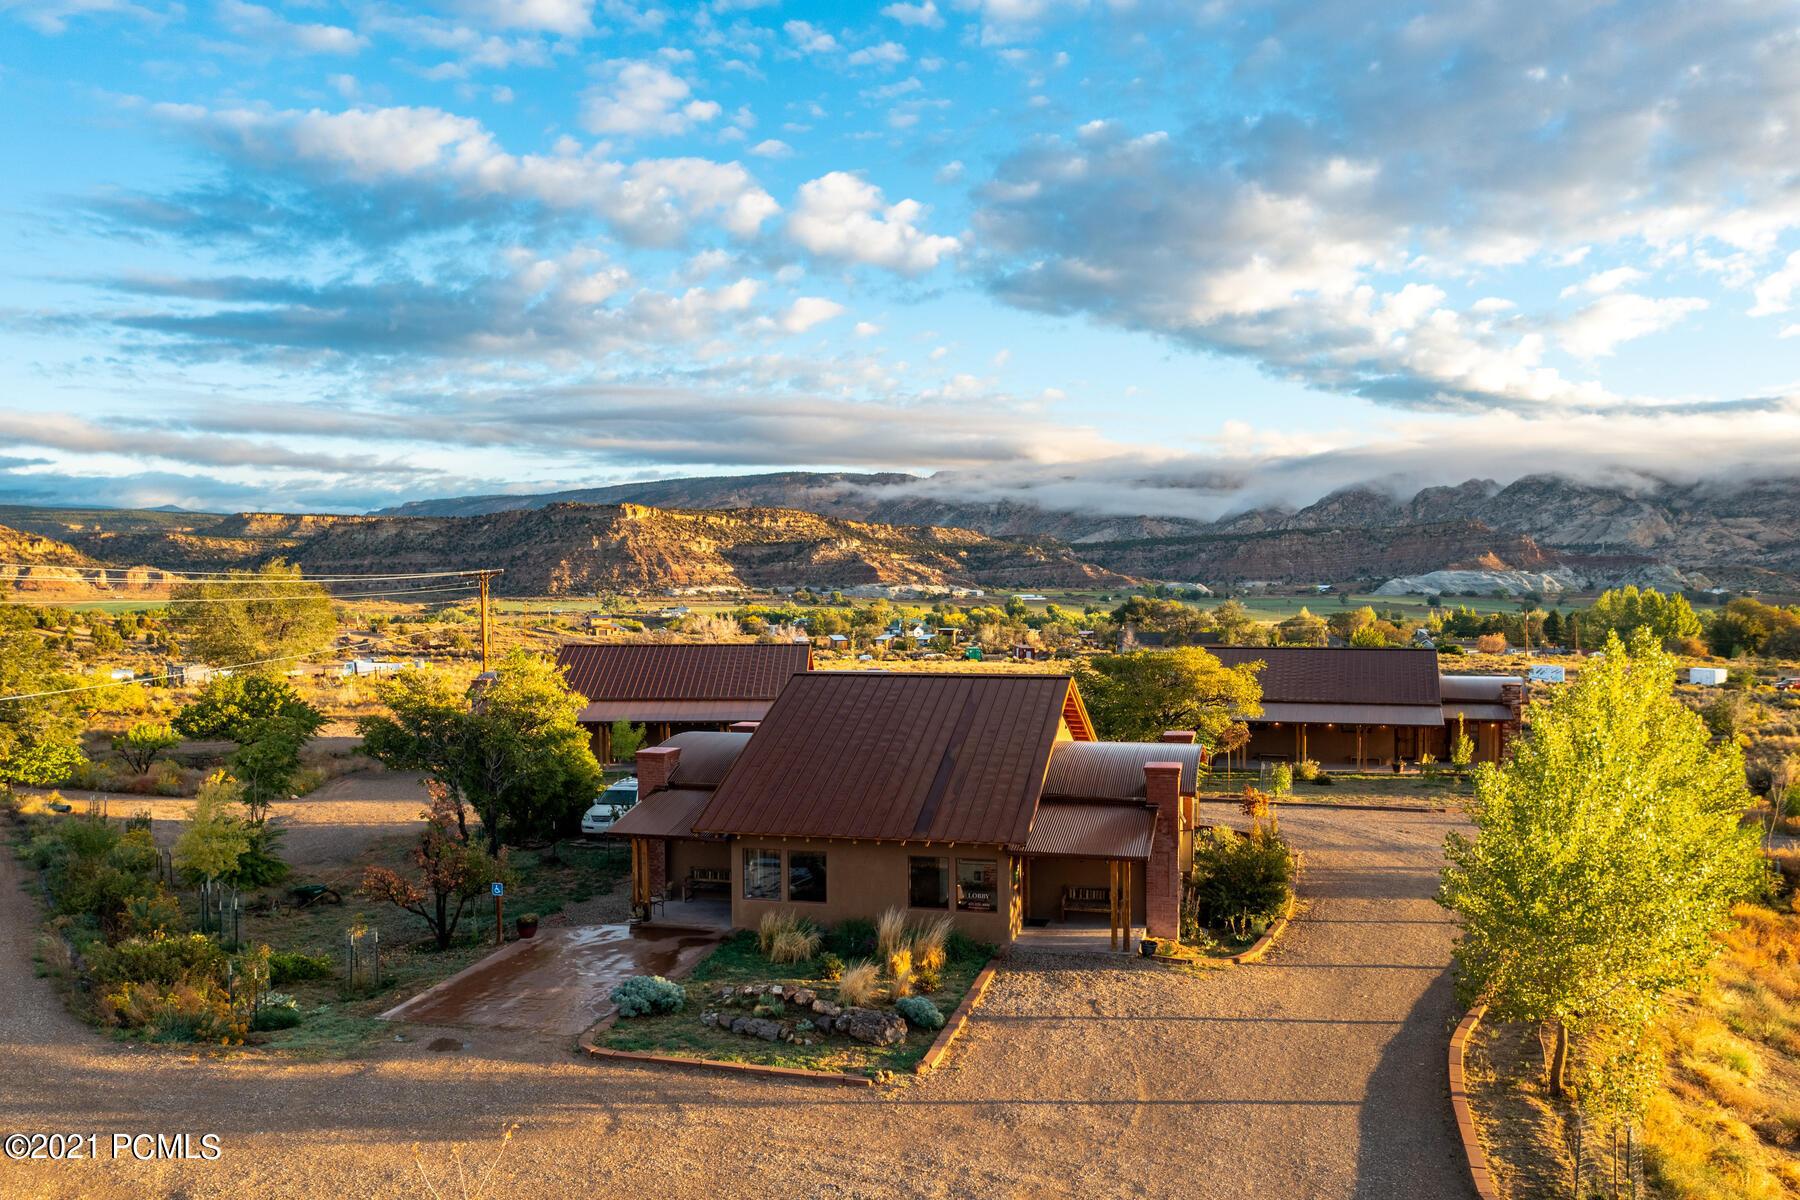 480 Main Street, Hwy 12, Escalante, Utah 84726, ,Commercial,For Sale,Main Street, Hwy 12,12104158